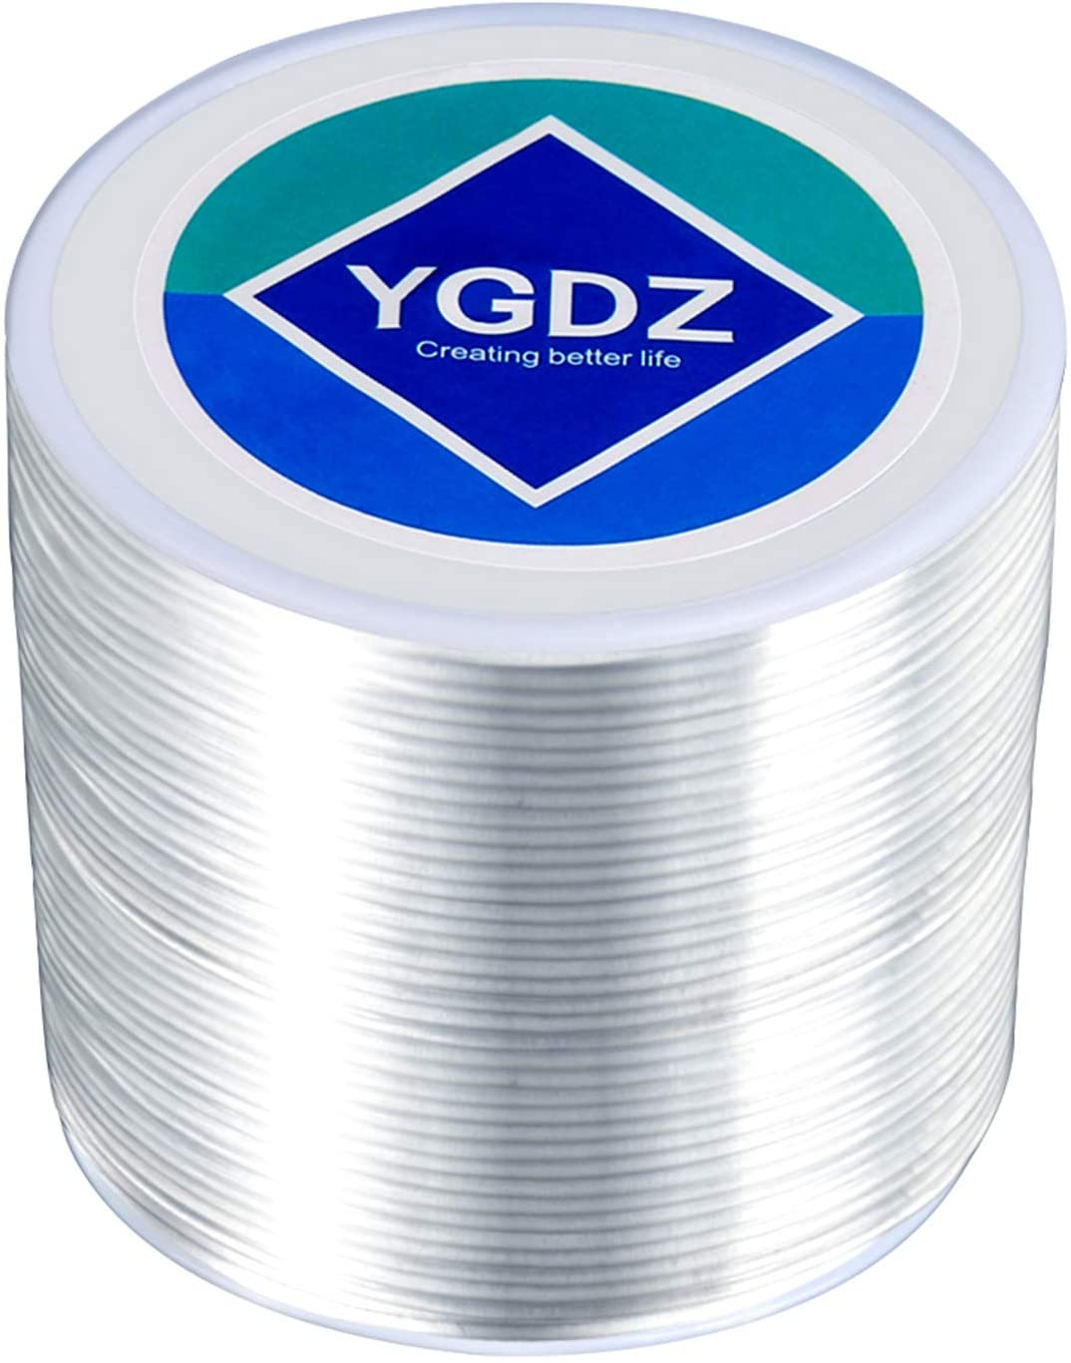 1.5mm Bracelet String YGDZ Crystal unisex Elastic Stretch Charlotte Mall Threa